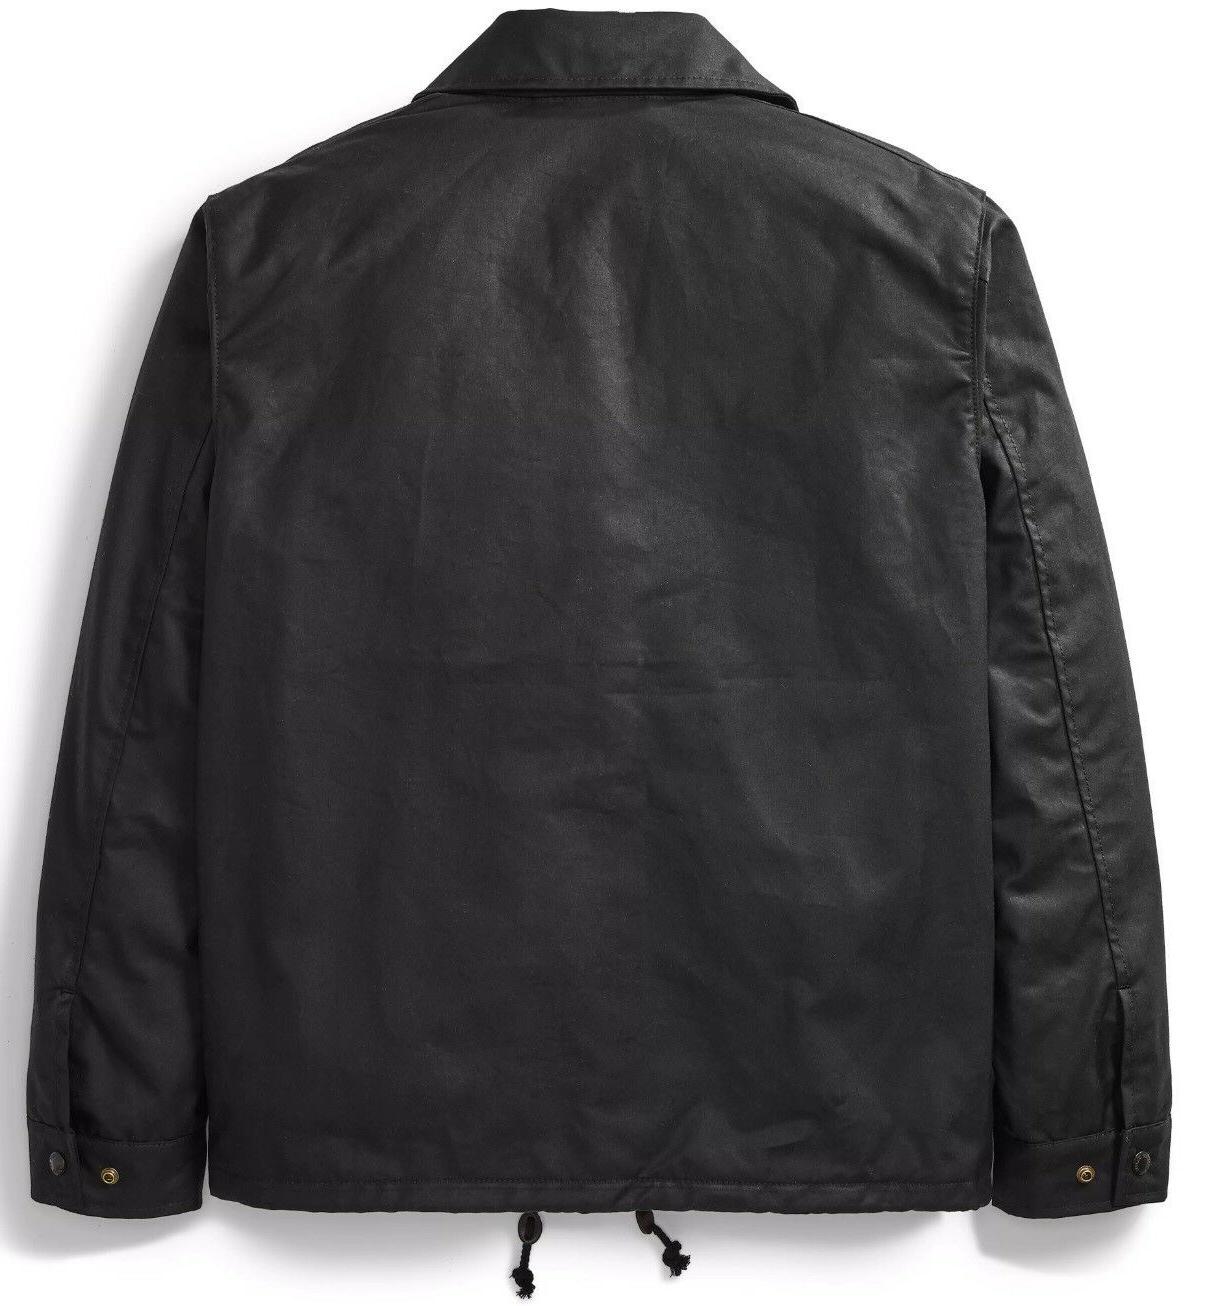 Filson Jacket NWT $350